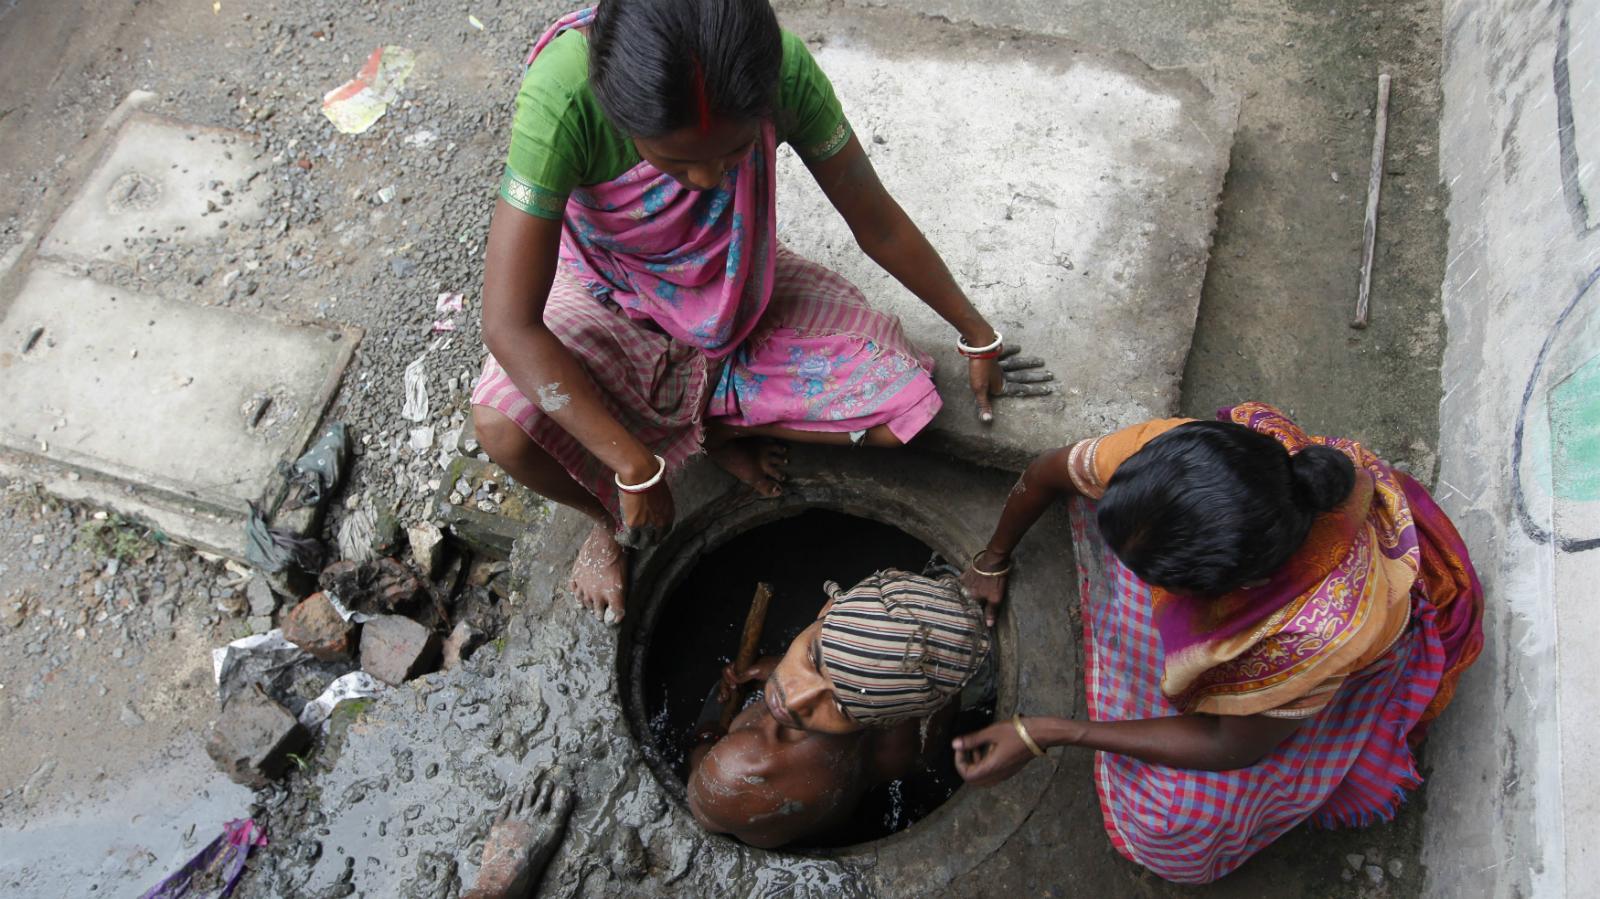 India-Sewer-Death-Delhi